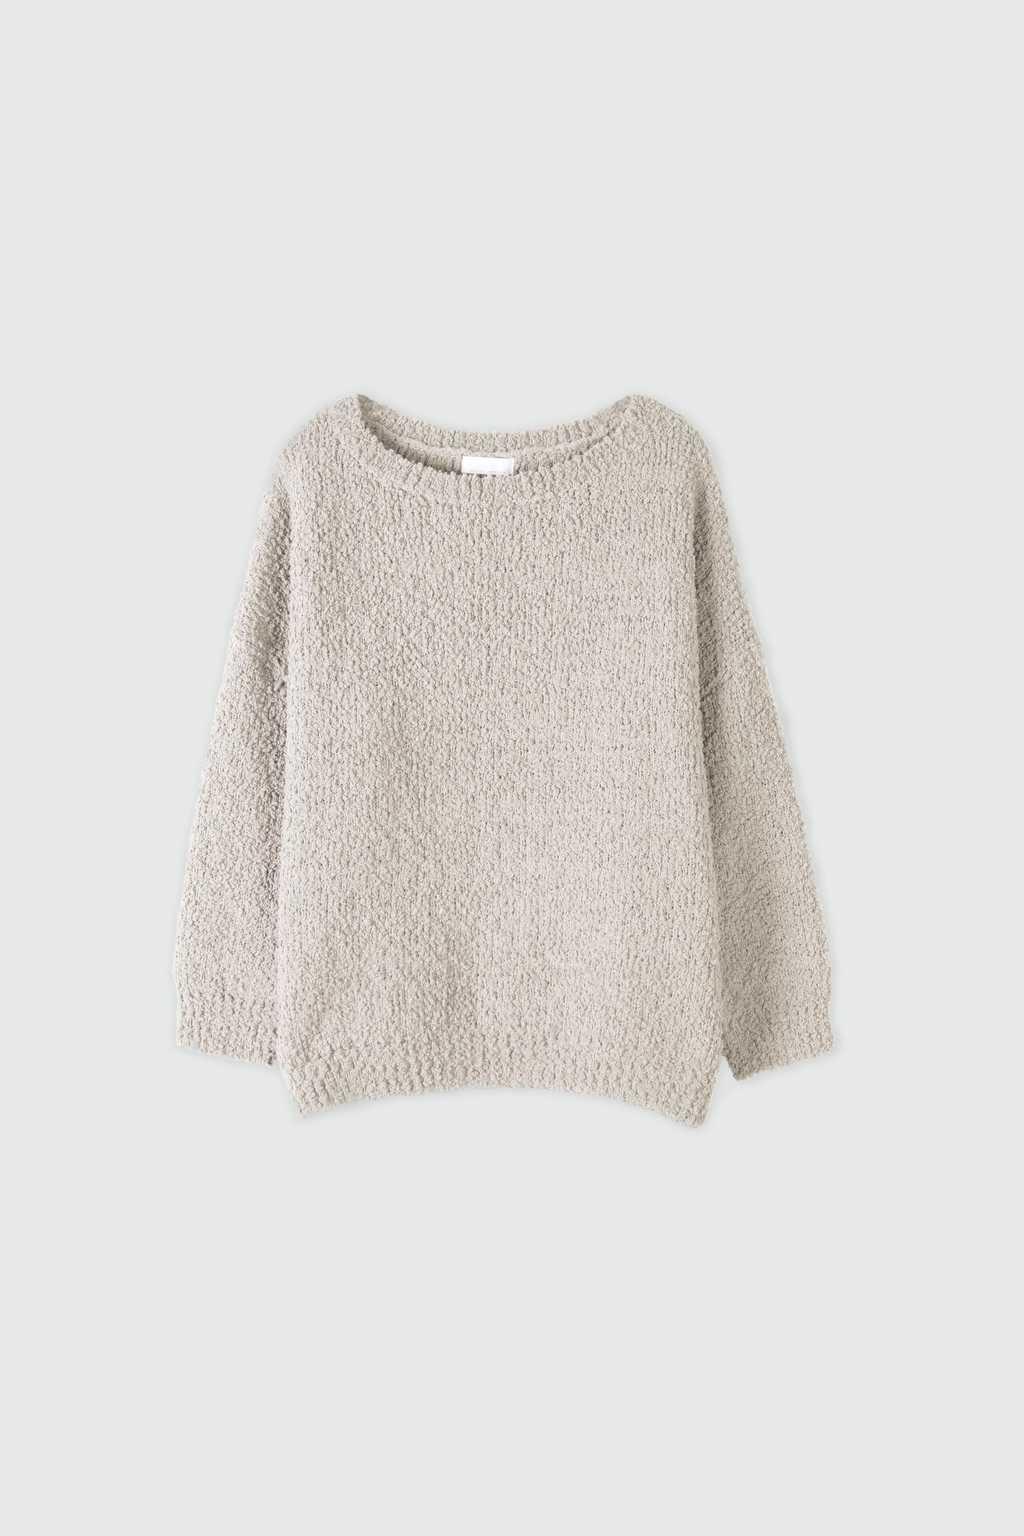 Sweater 3082 Oatmeal 6